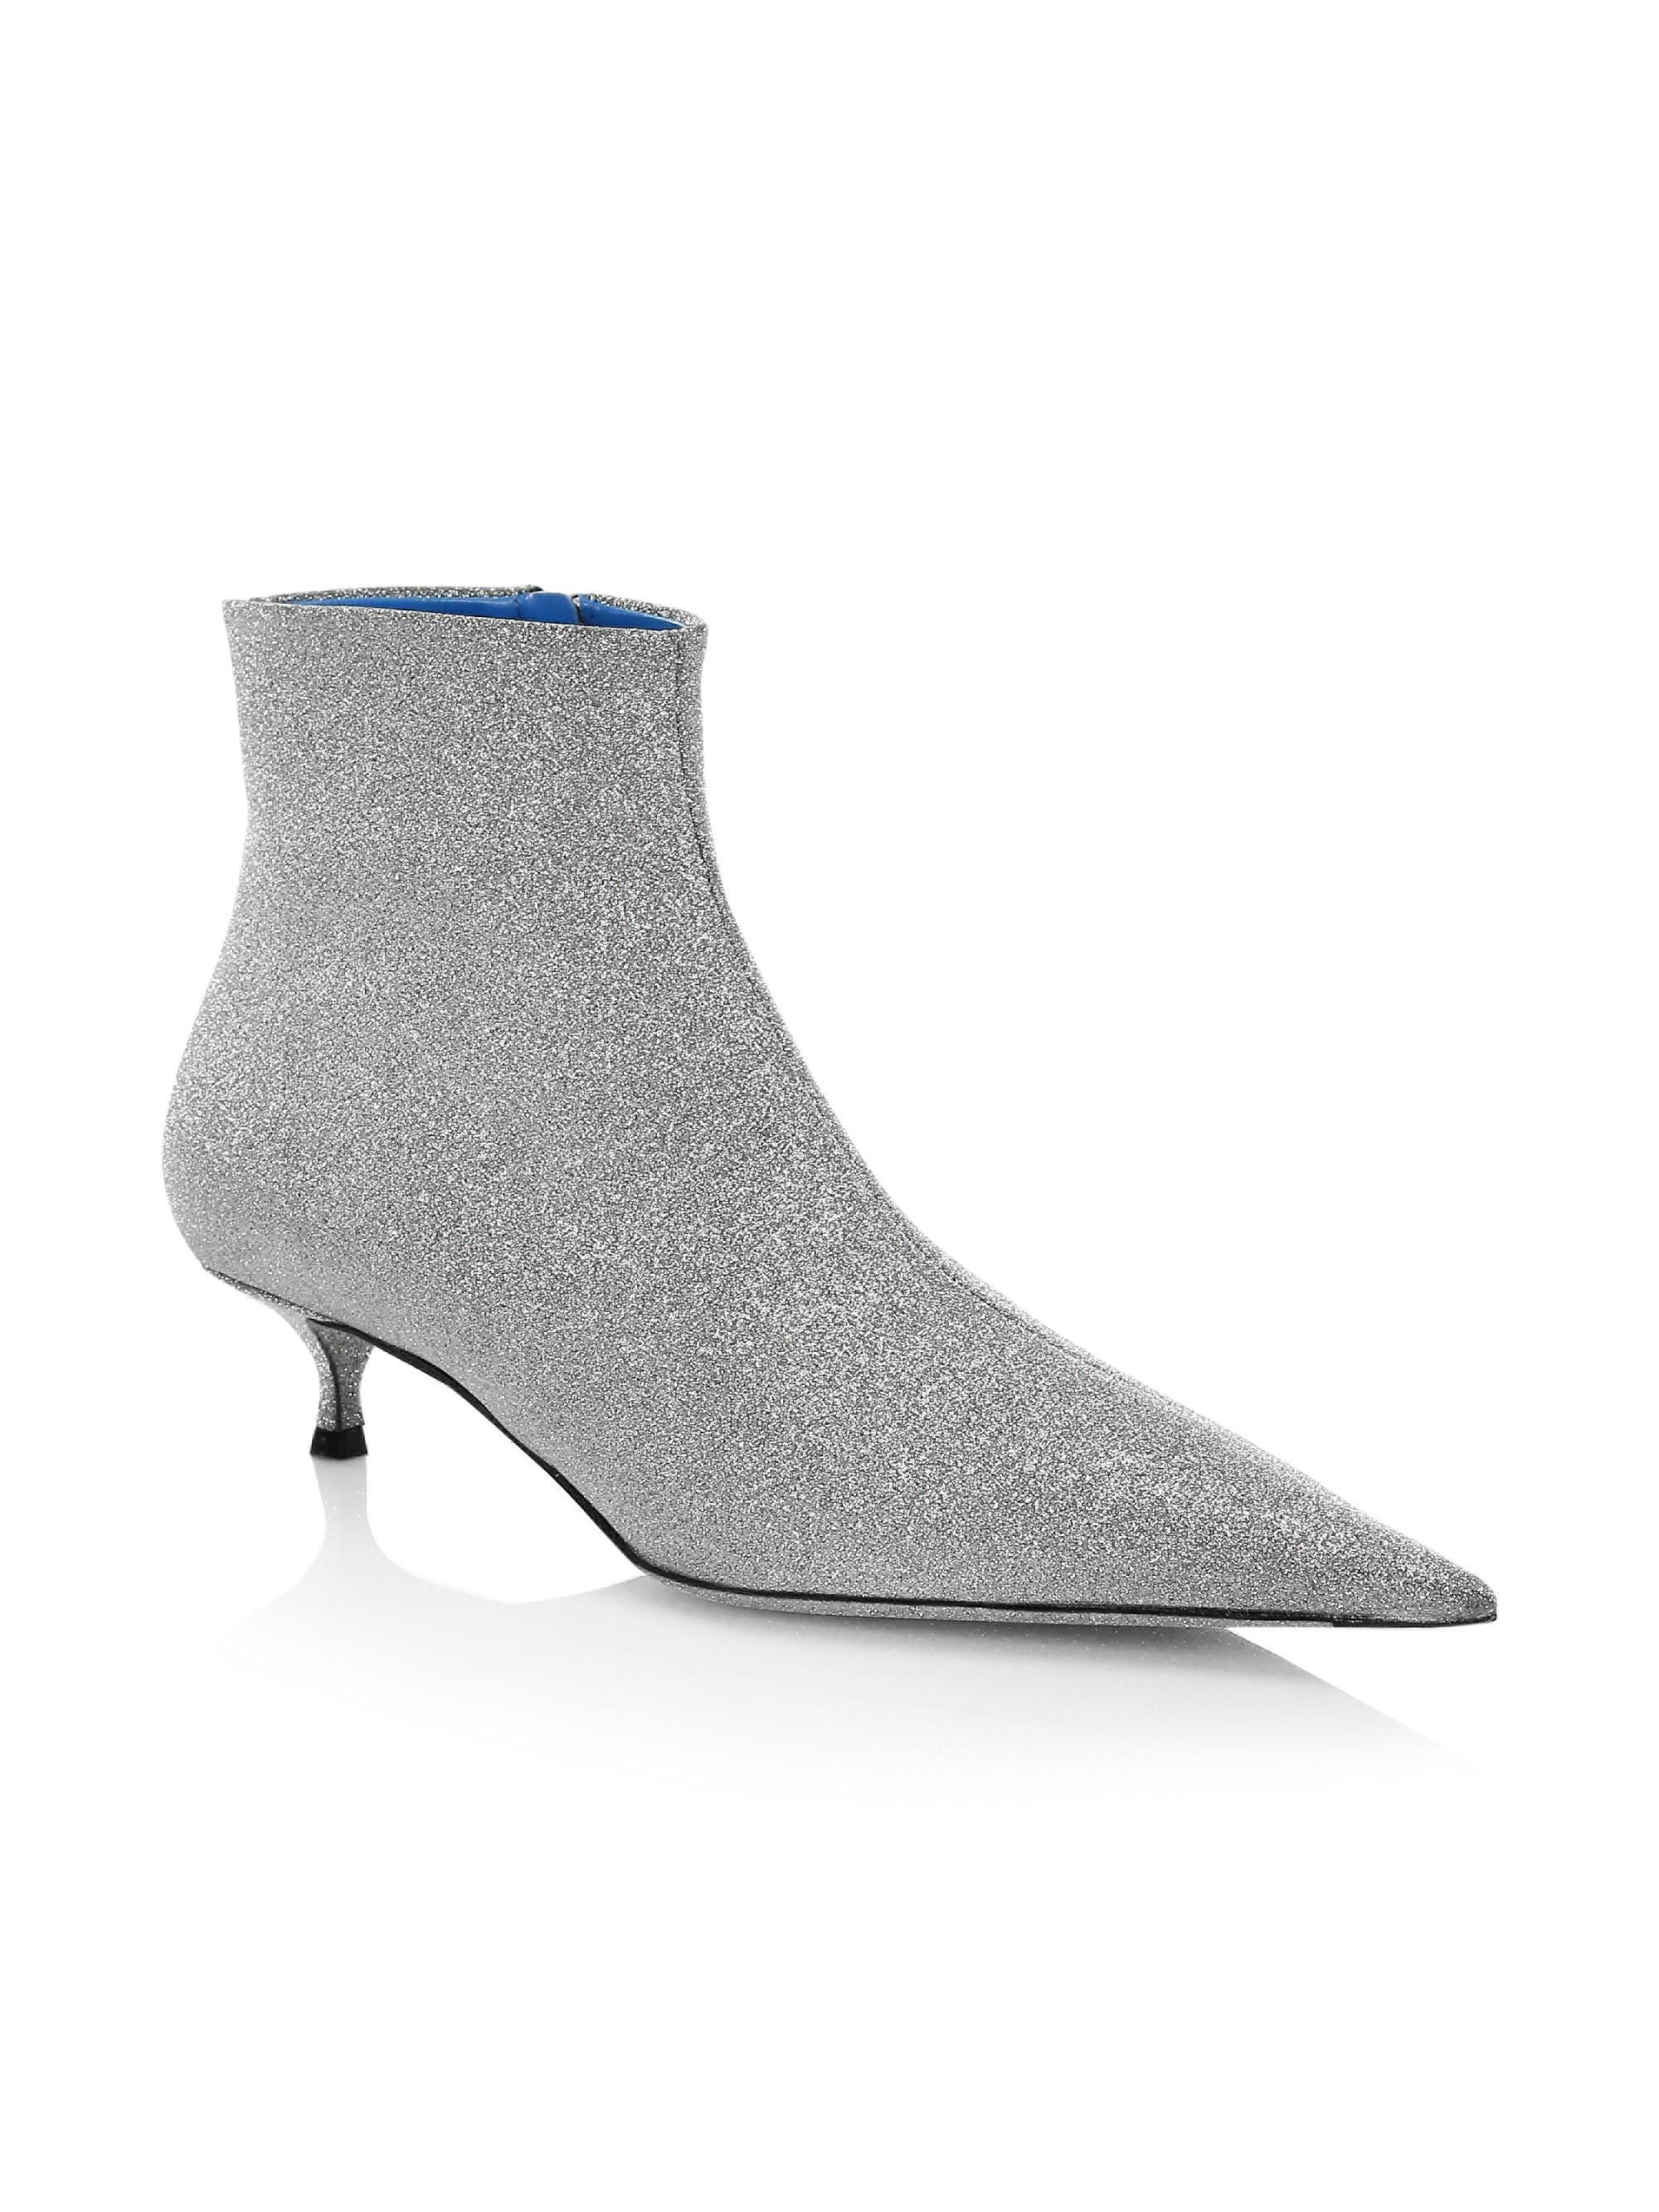 1663fa0f90 Lyst - Balenciaga Leather Glitter Kitten Heel Booties in Gray